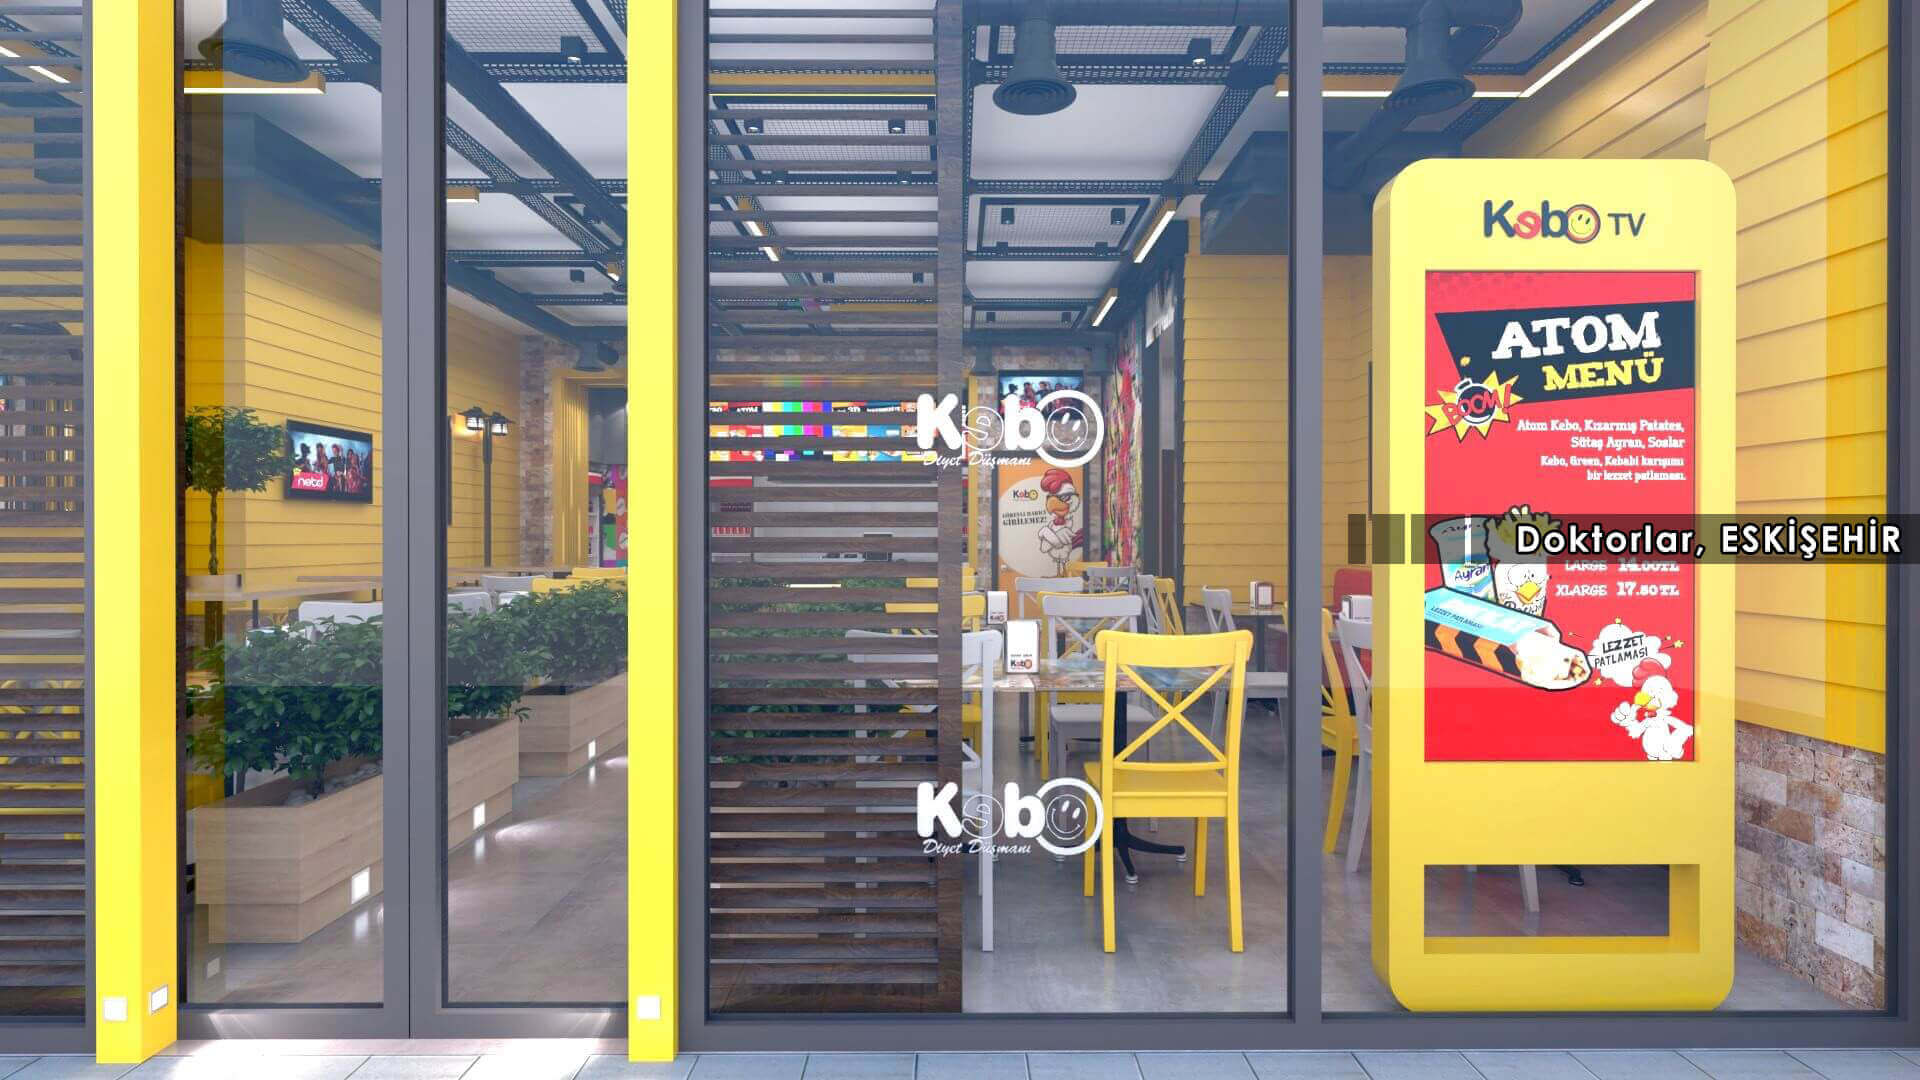 Restoran tasarımı 2121 Kebo 2018 Restoranlar